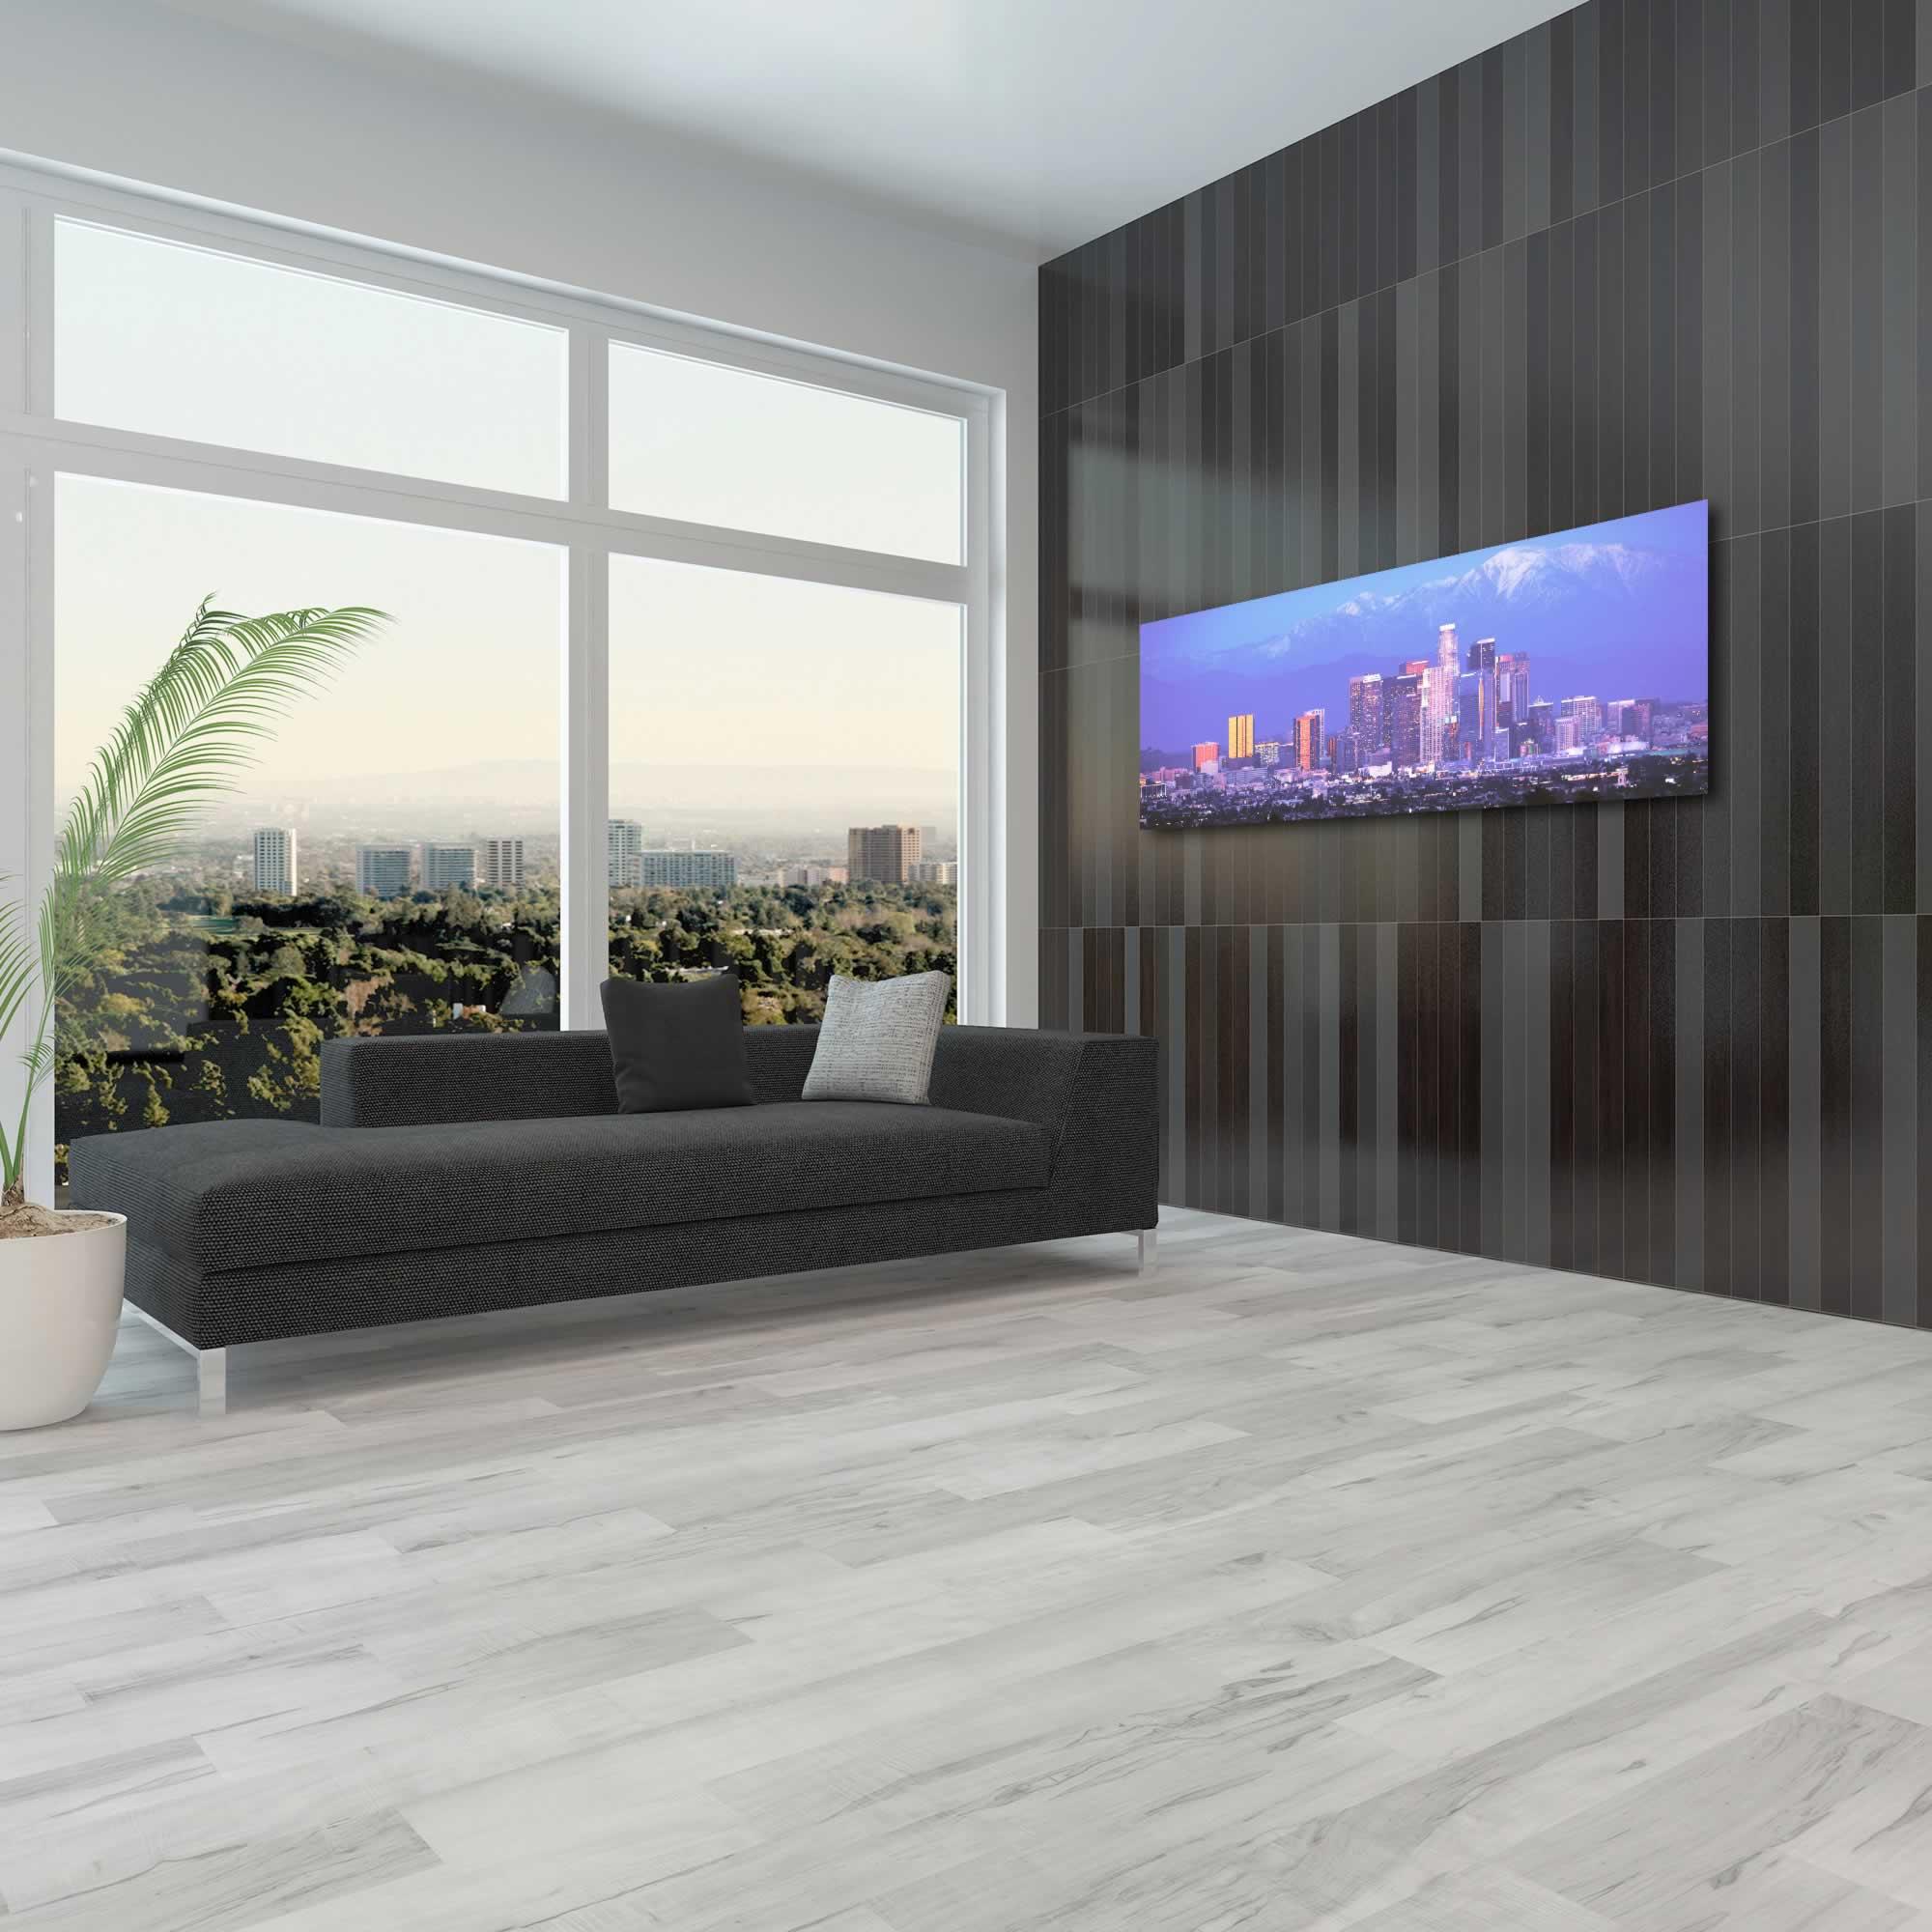 Los Angeles City Skyline - Urban Modern Art, Designer Home Decor, Cityscape Wall Artwork, Trendy Contemporary Art - Alternate View 3